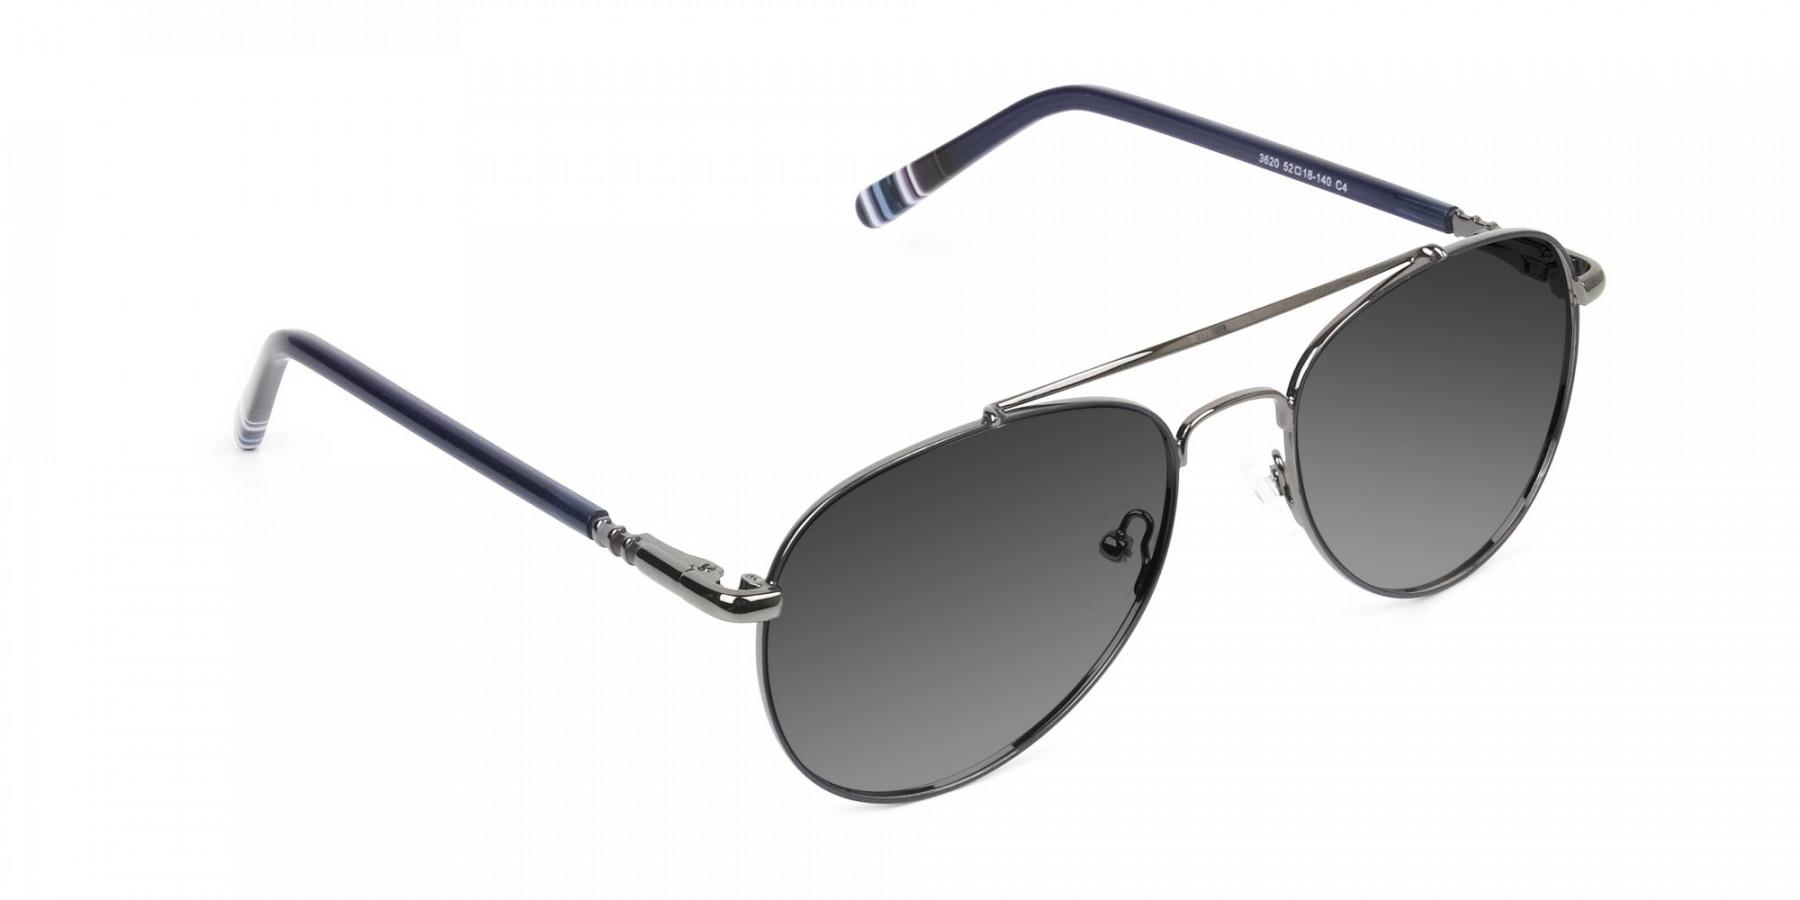 gunmetal-blue-fine-metal-grey-tinted-aviator-sunglasses-frames-3